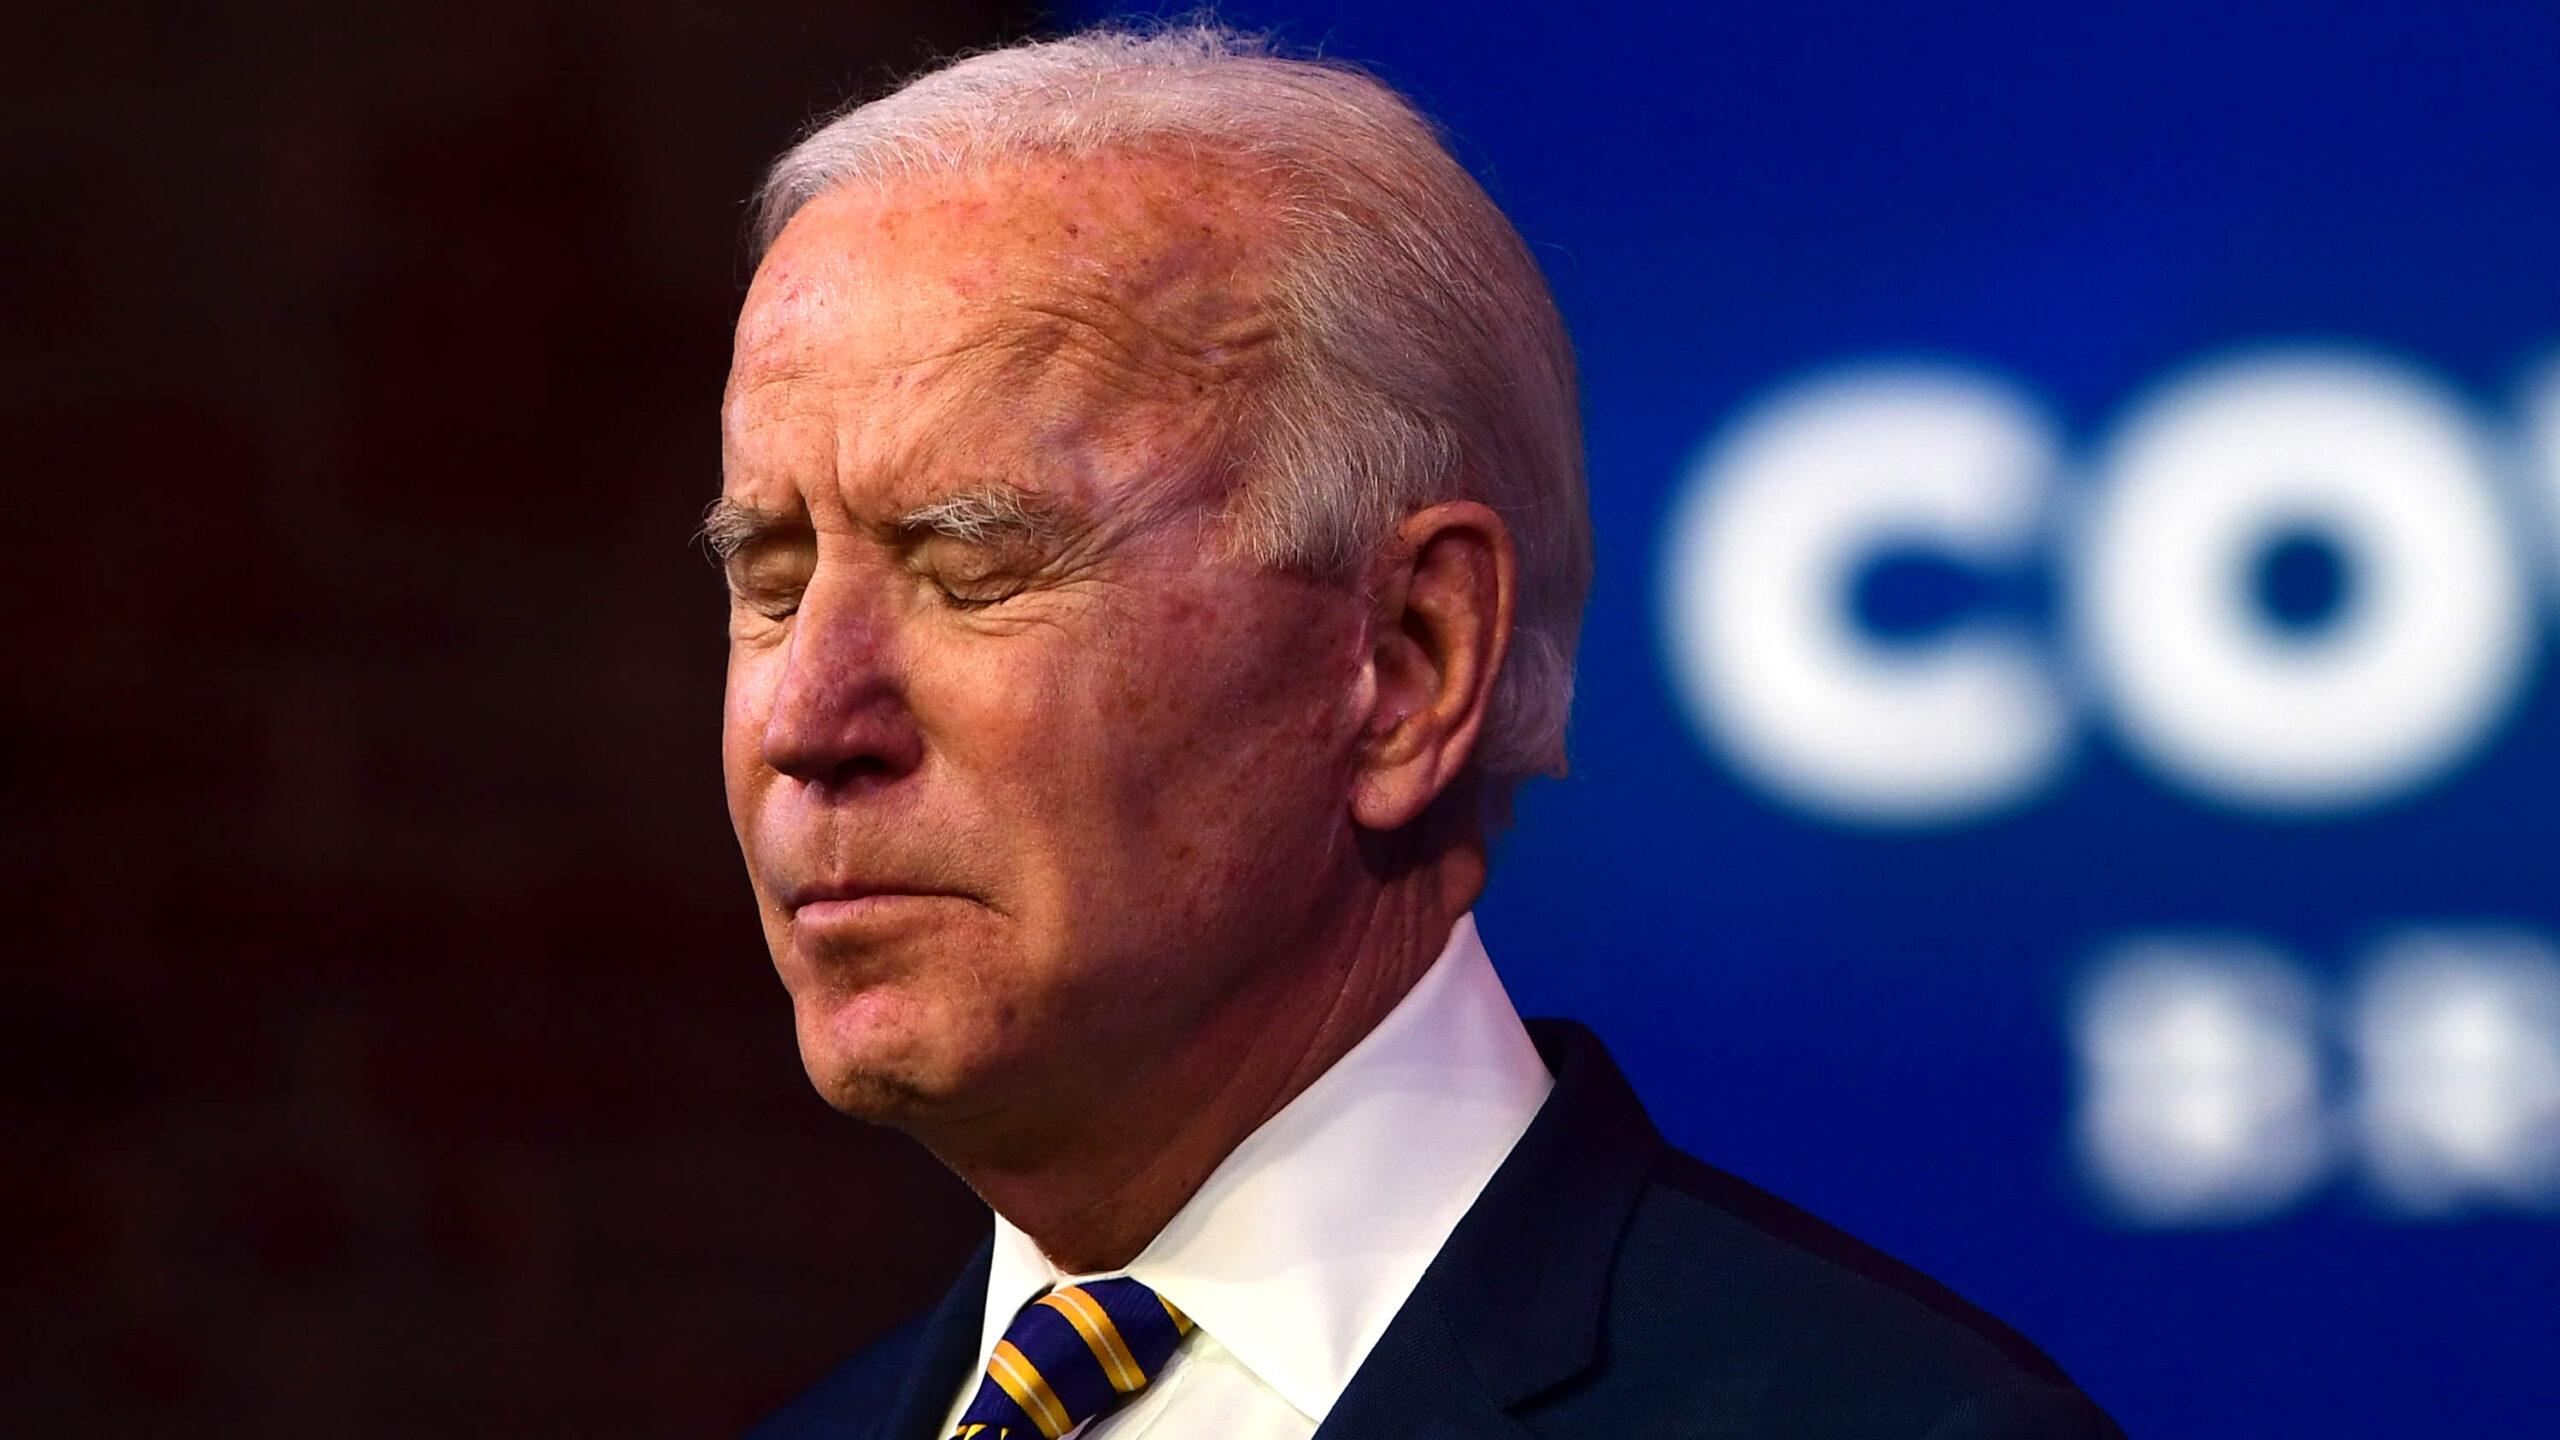 Biden Urges Senate To Refocus On 'Important Business' As Dems Push For Impeachment Trial